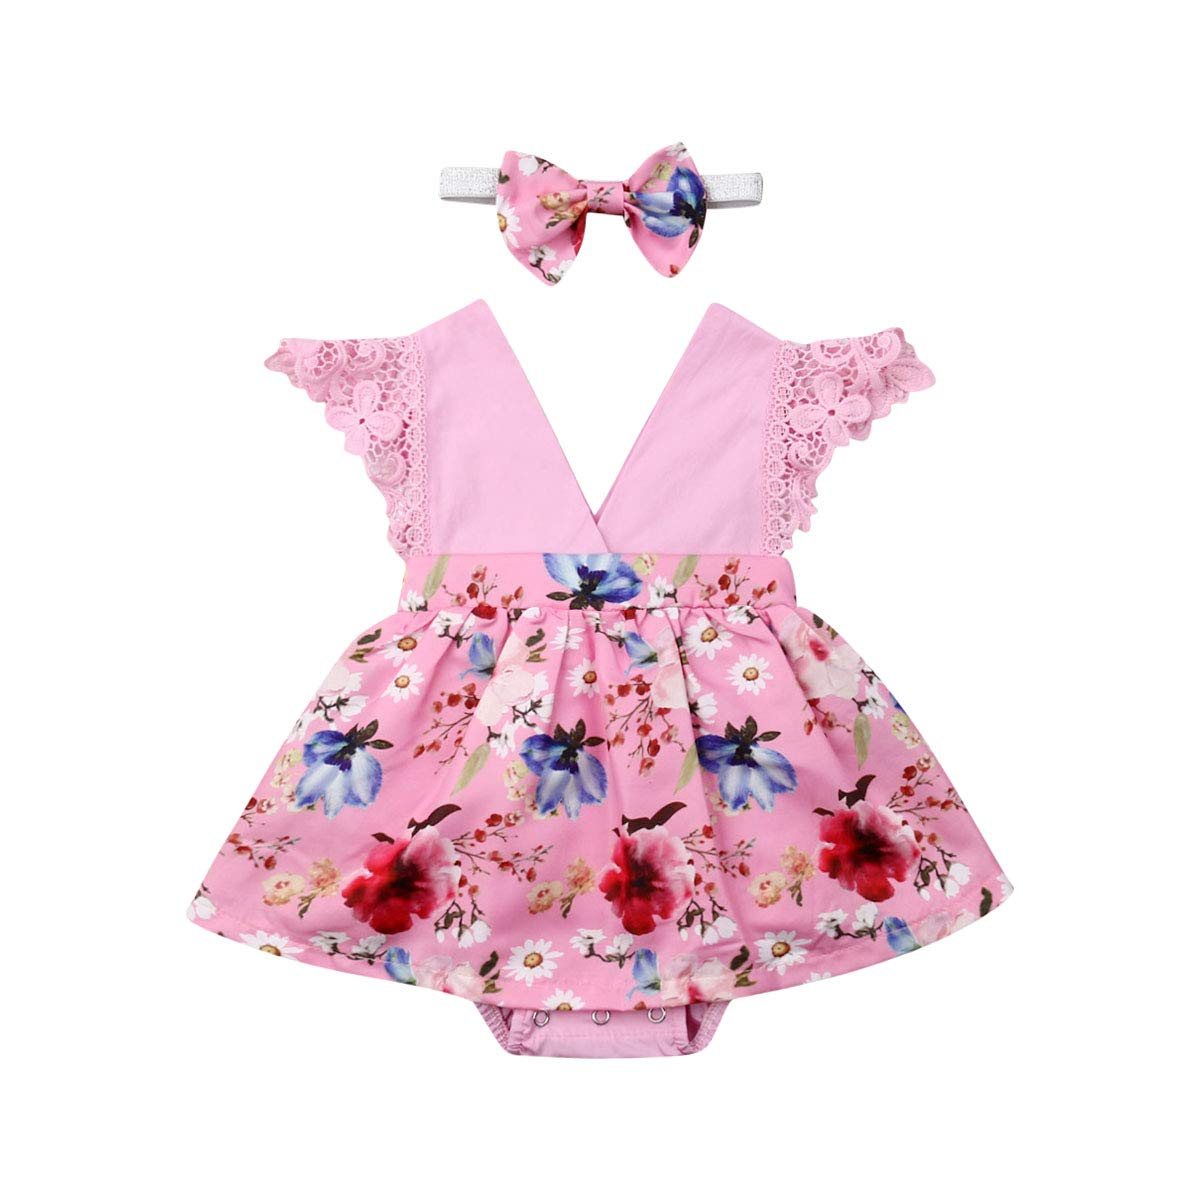 Toddler Baby Girl 2Pcs Romper Headband Floral Sleeveless Lace Infant Newborn Jumpsuit Sets